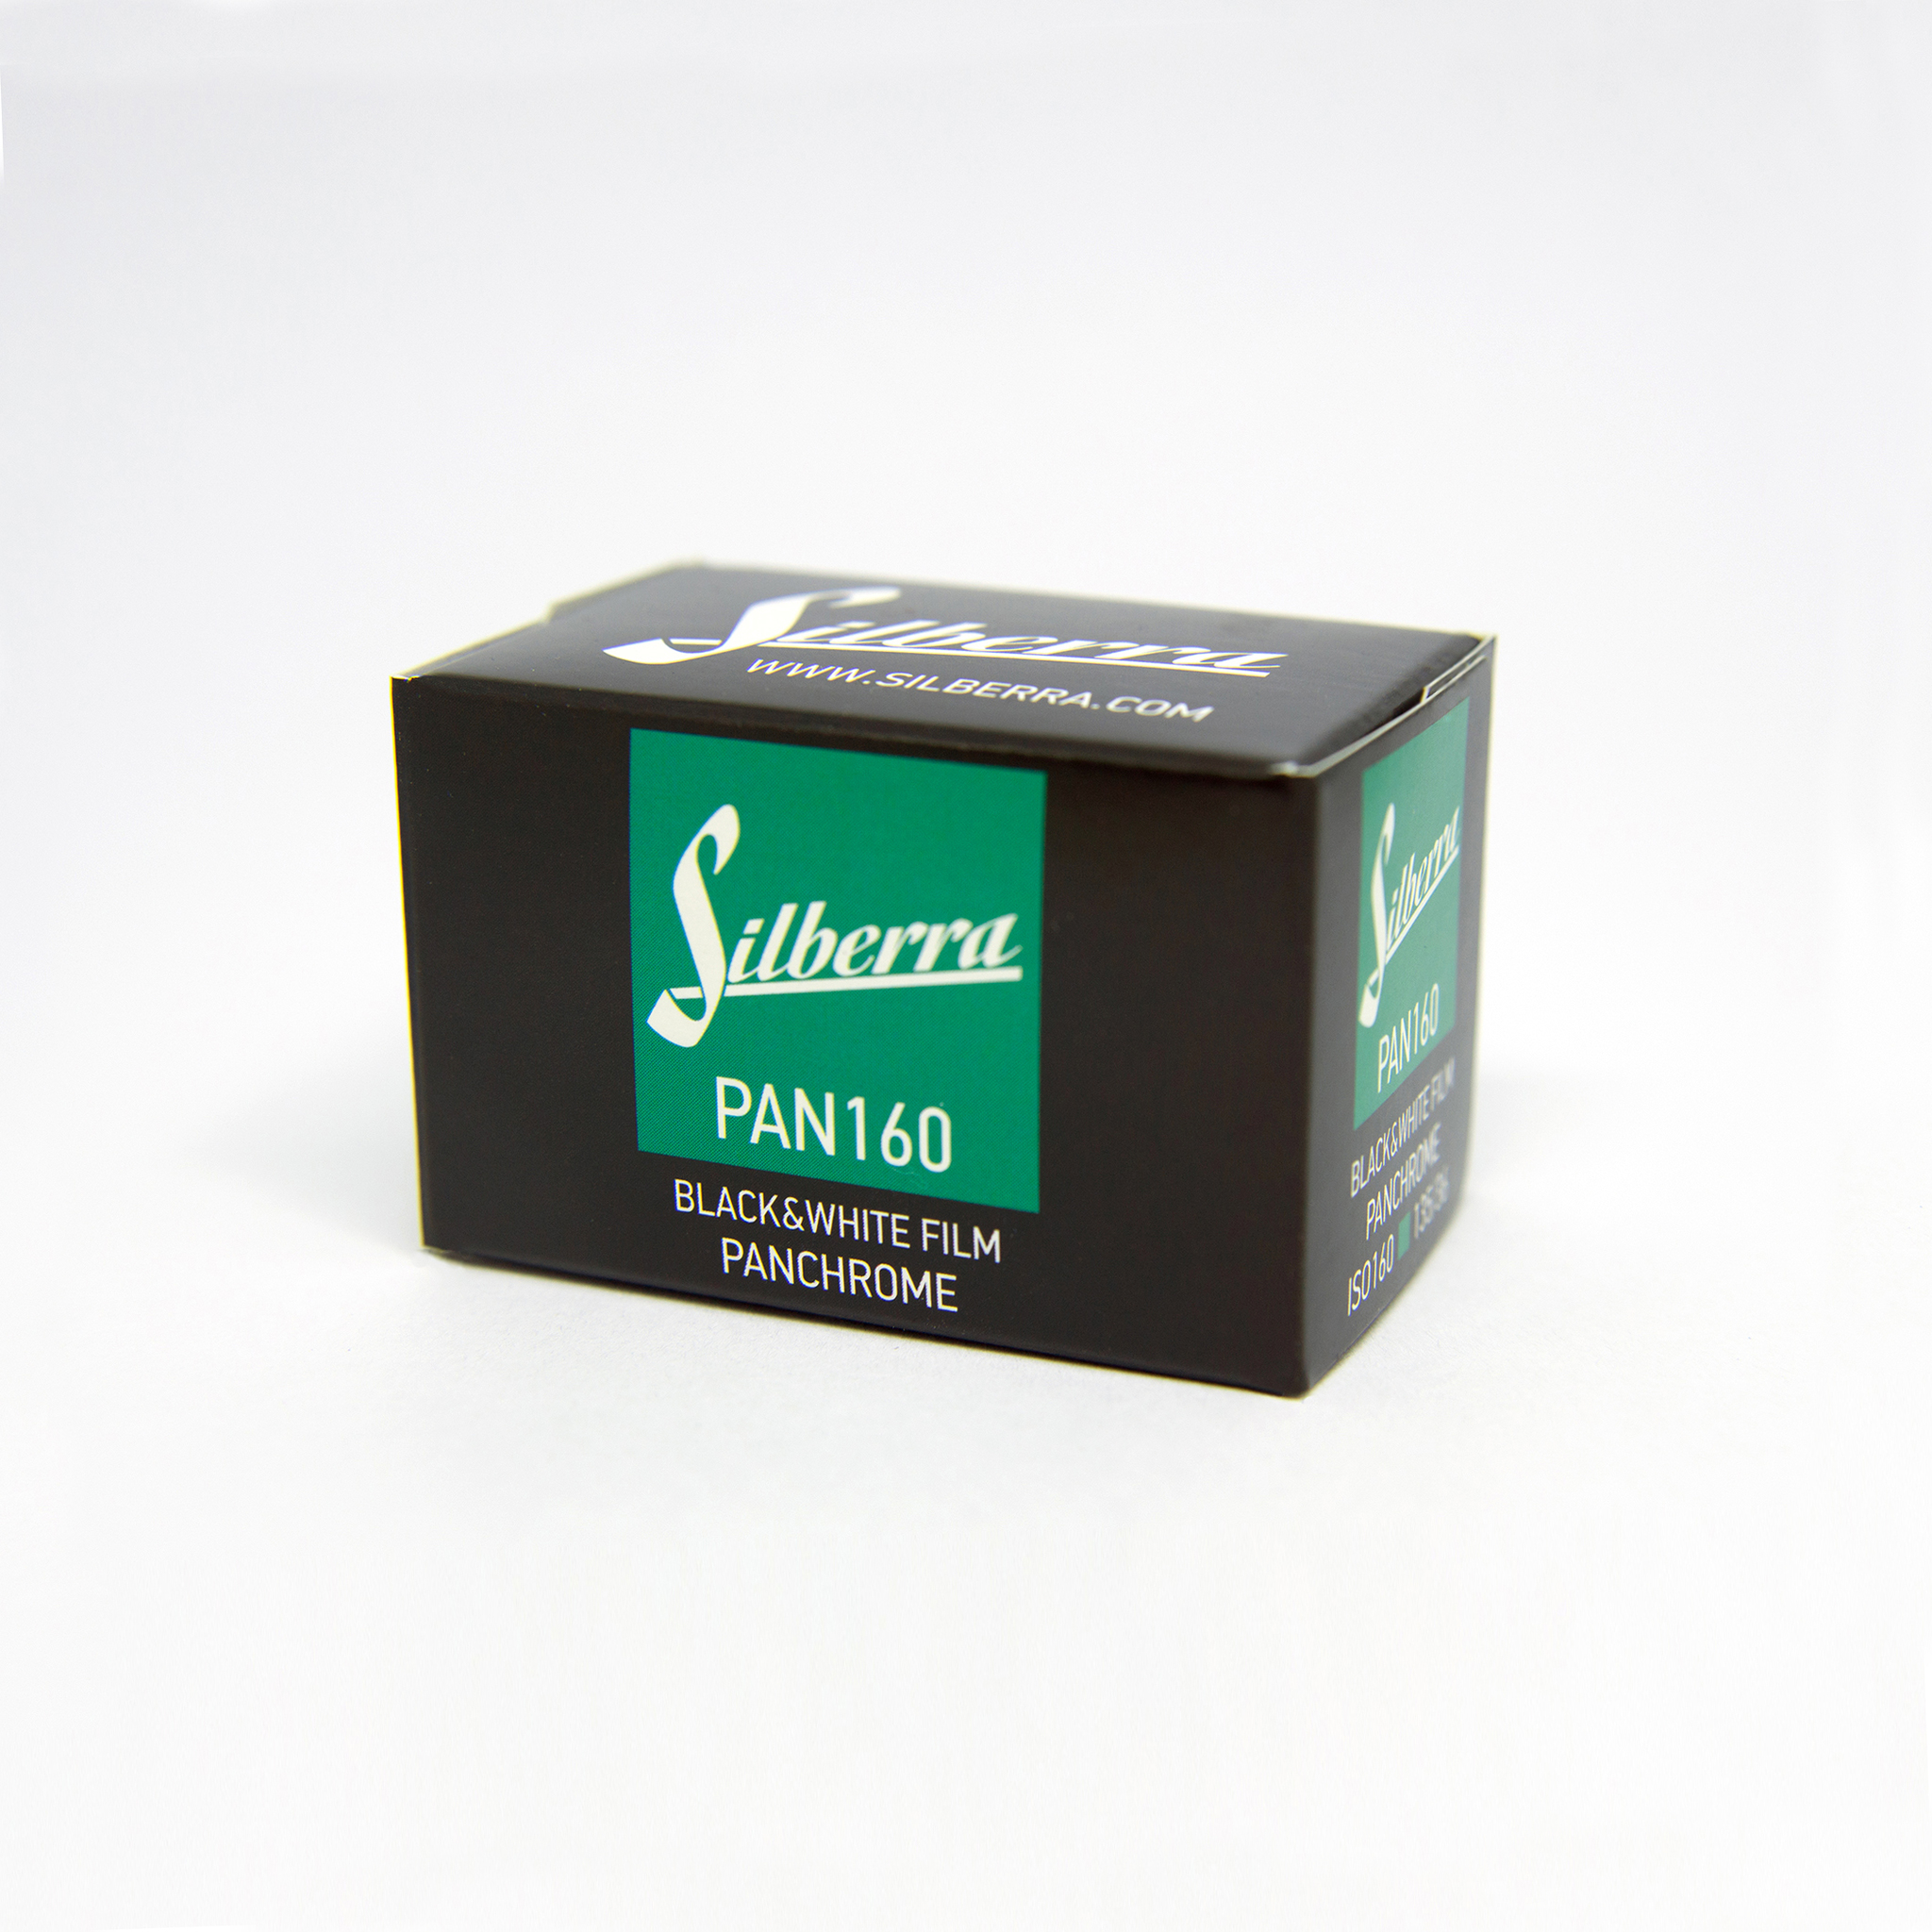 Фотопленка Silberra PAN160, ISO 160, 135/36